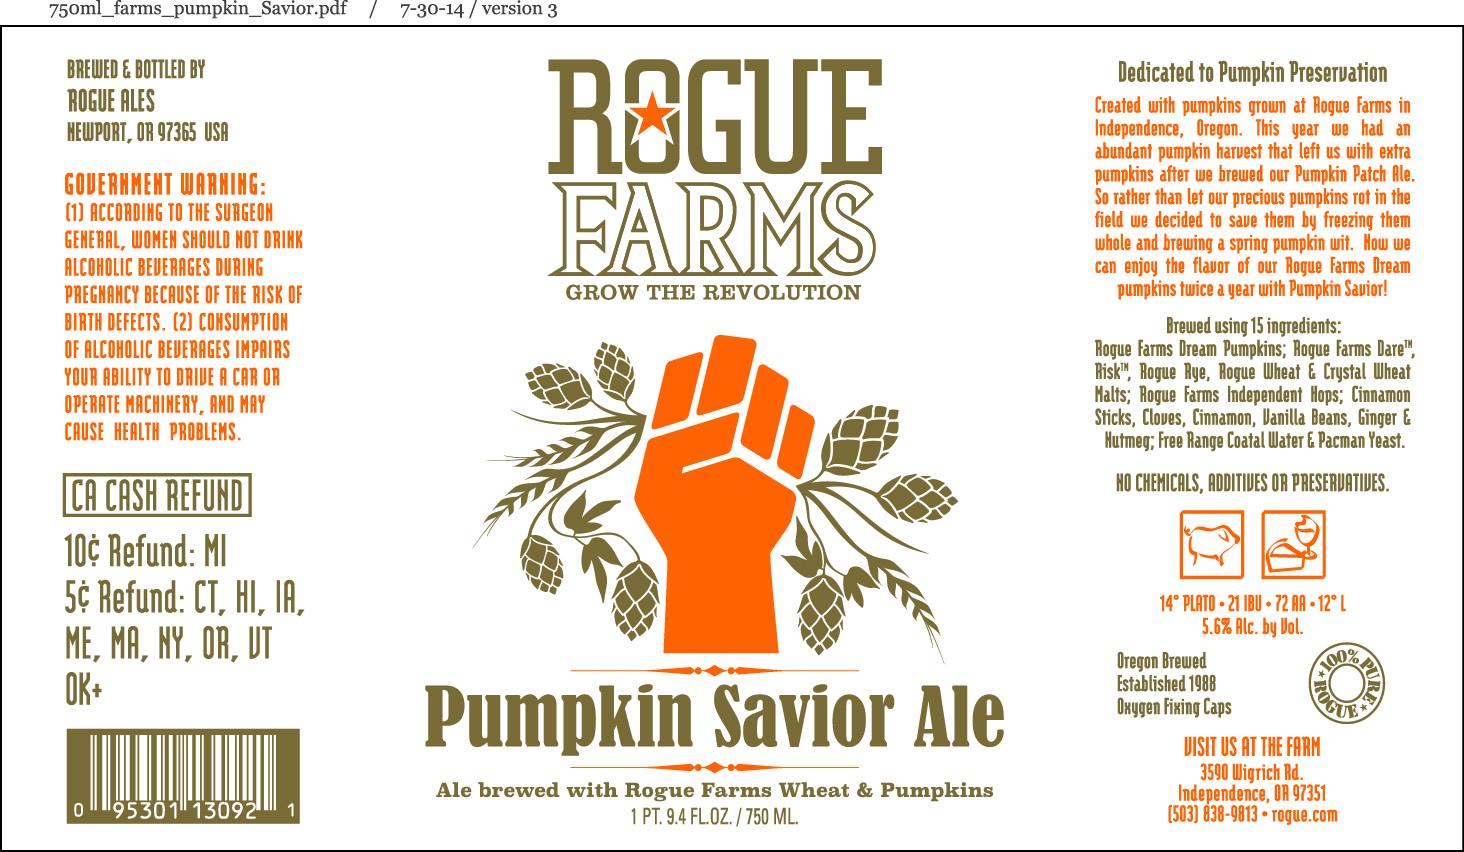 Rogue-Farms-Pumpkin-Savior-Ale.jpg